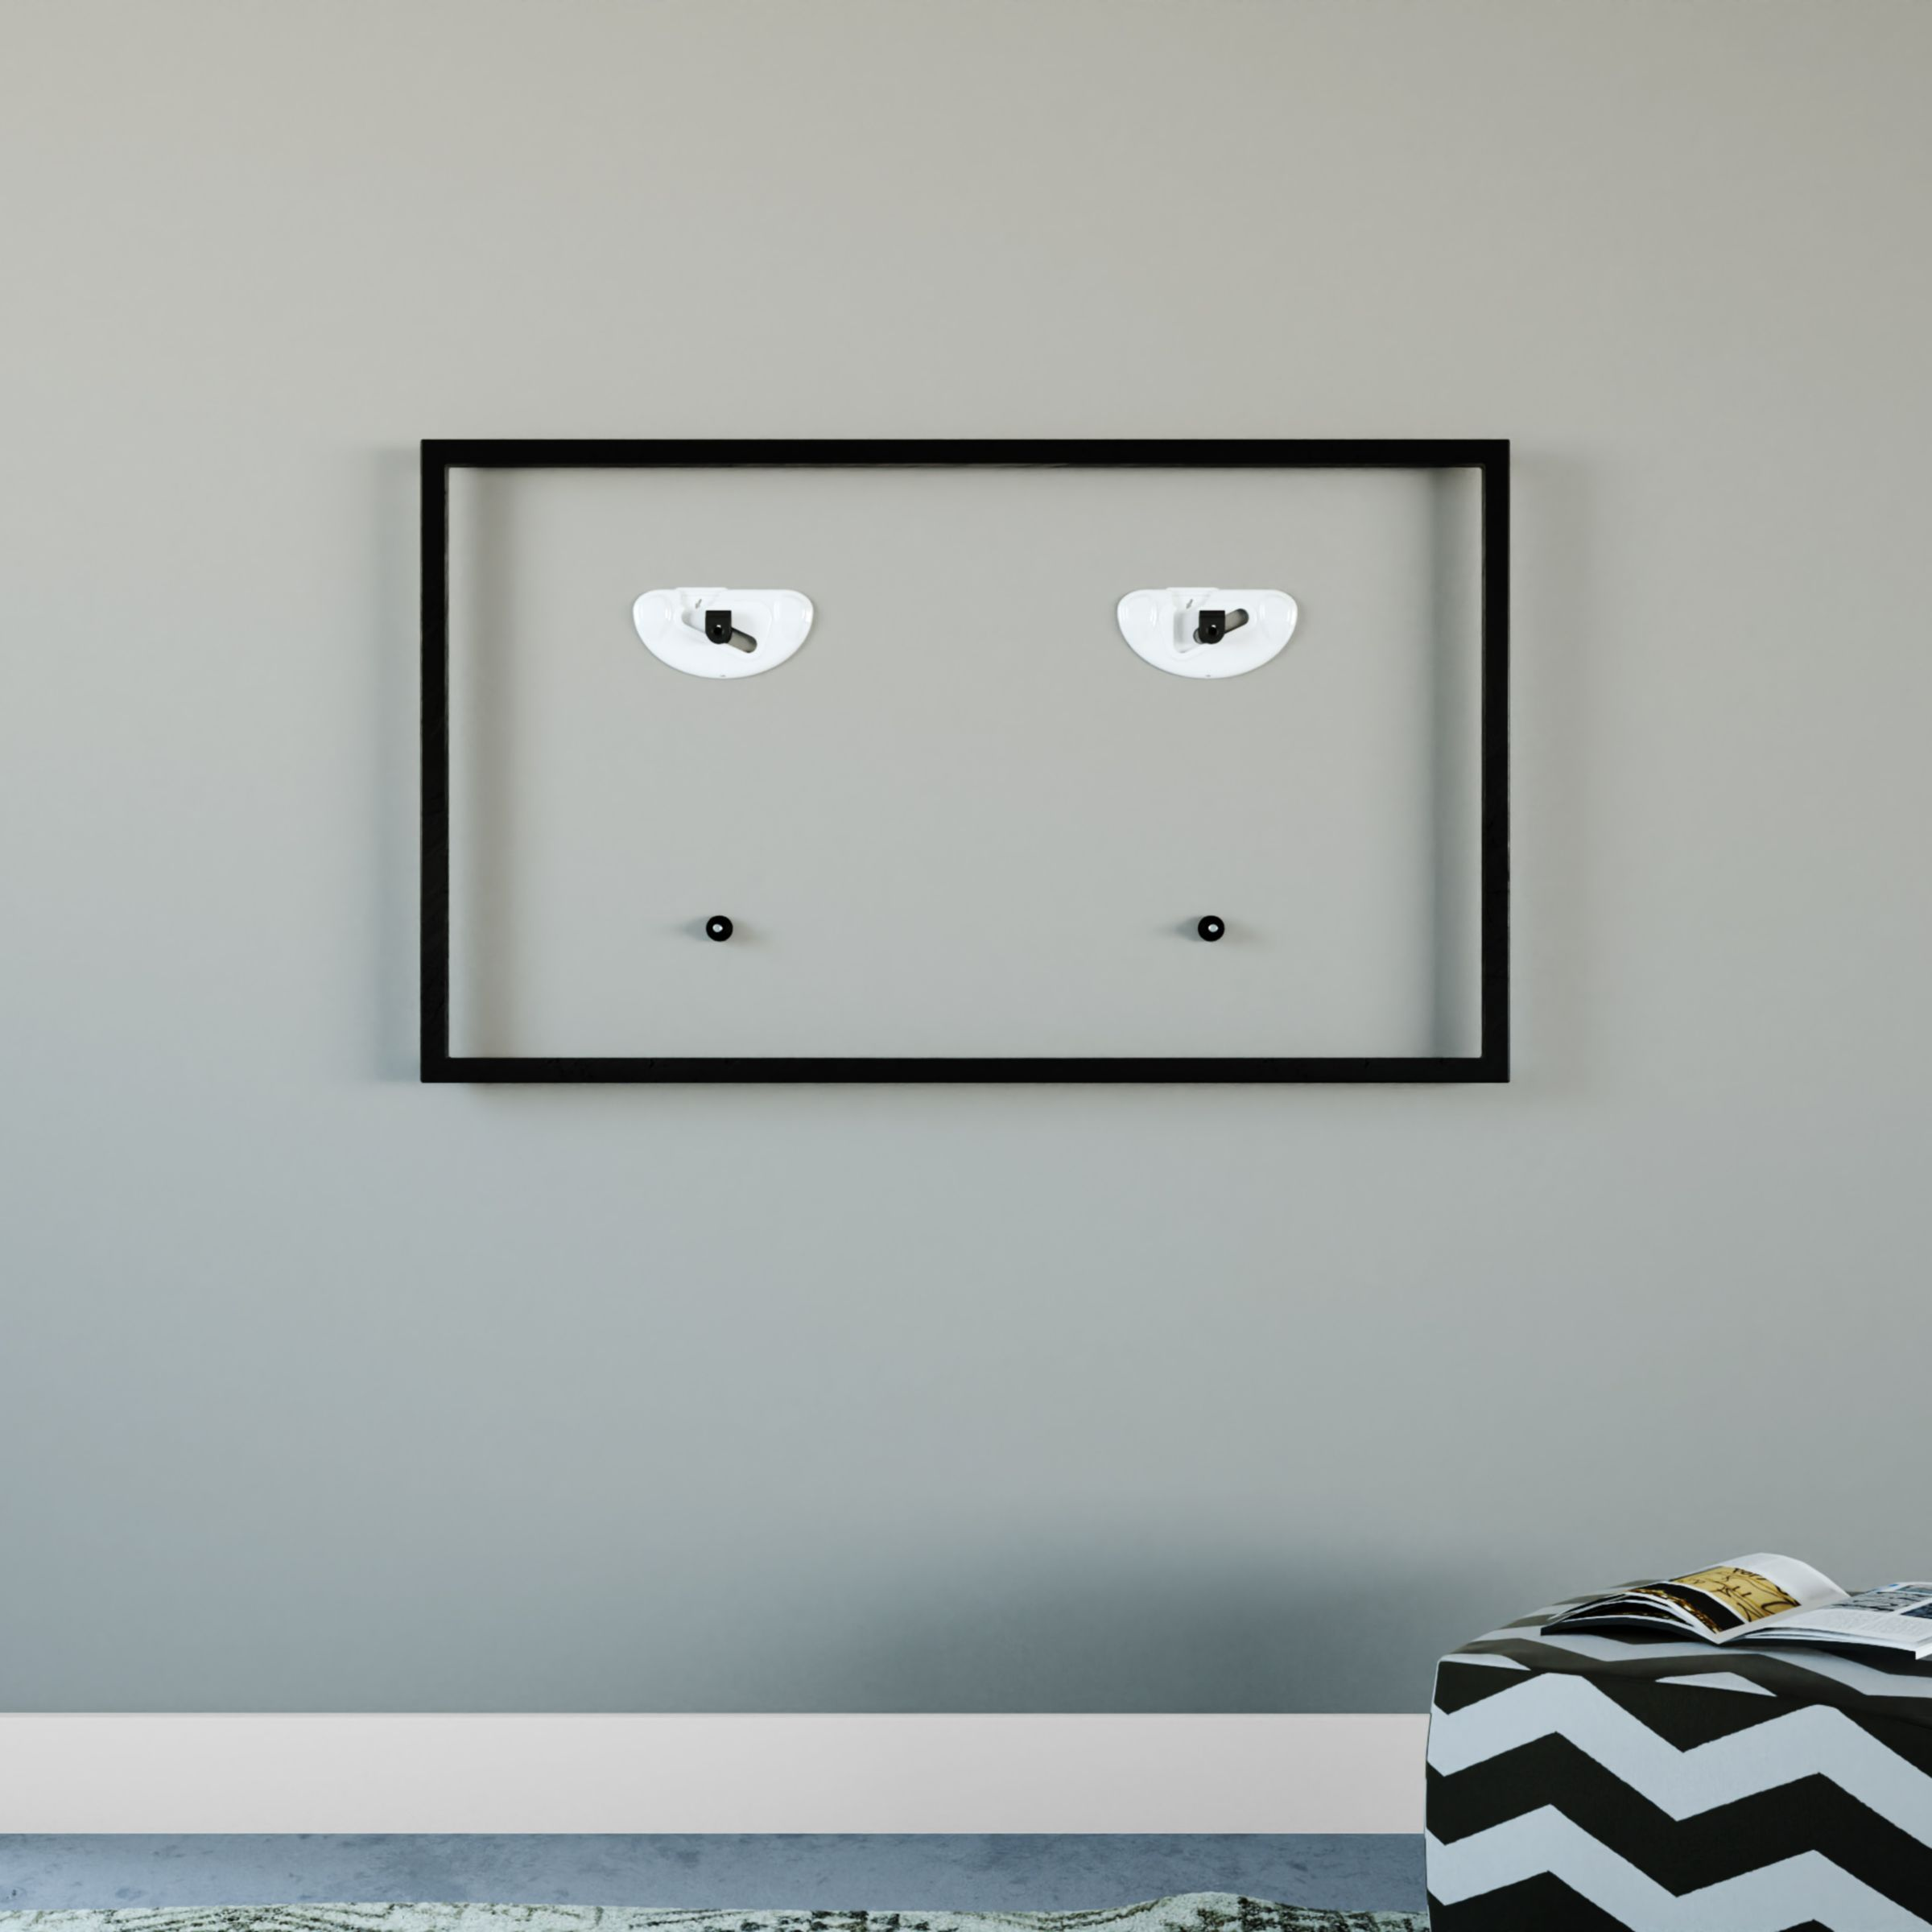 Fixed wall mounts